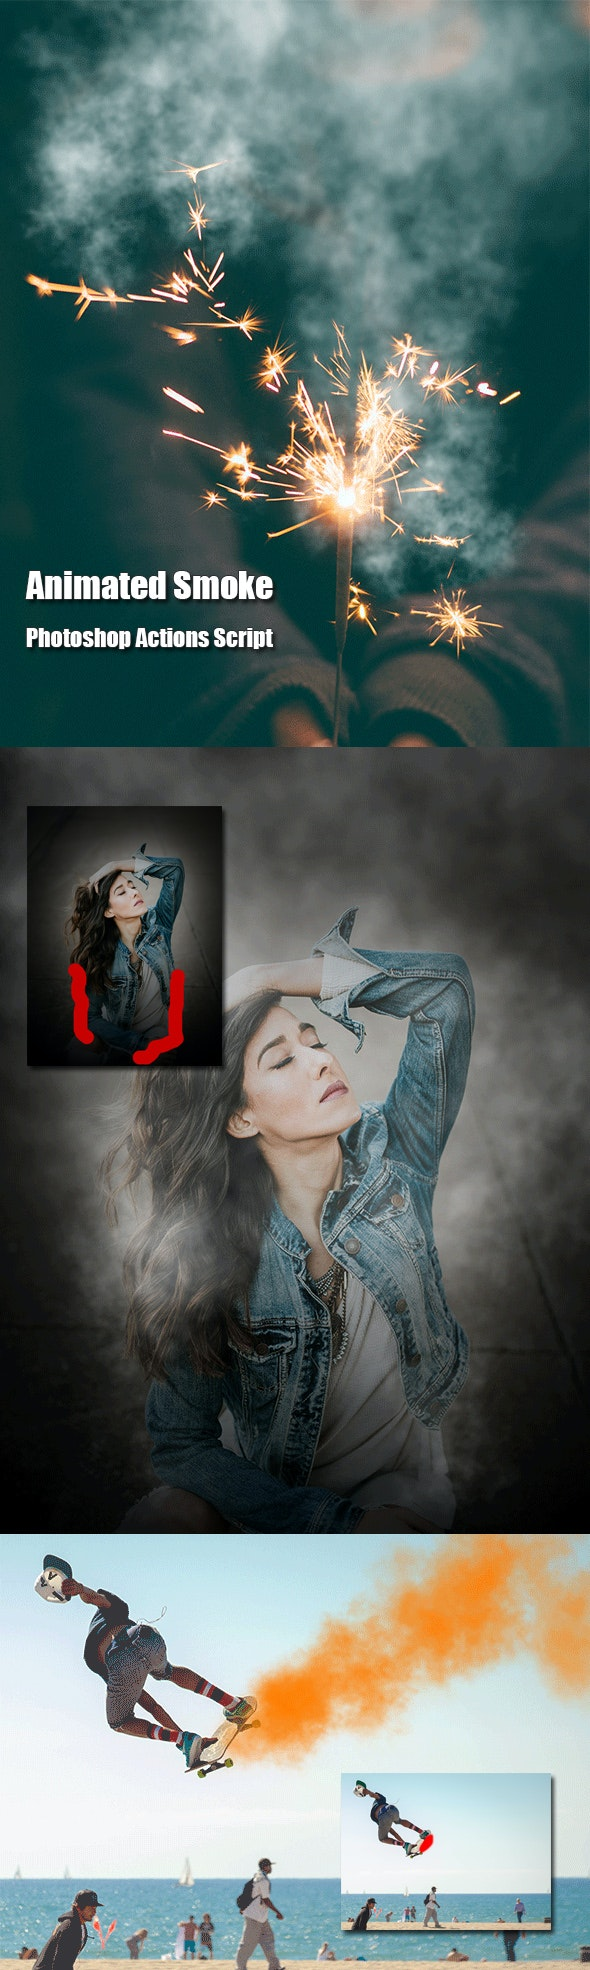 Animated Smoke Photoshop Add-on - Photo Effects Actions